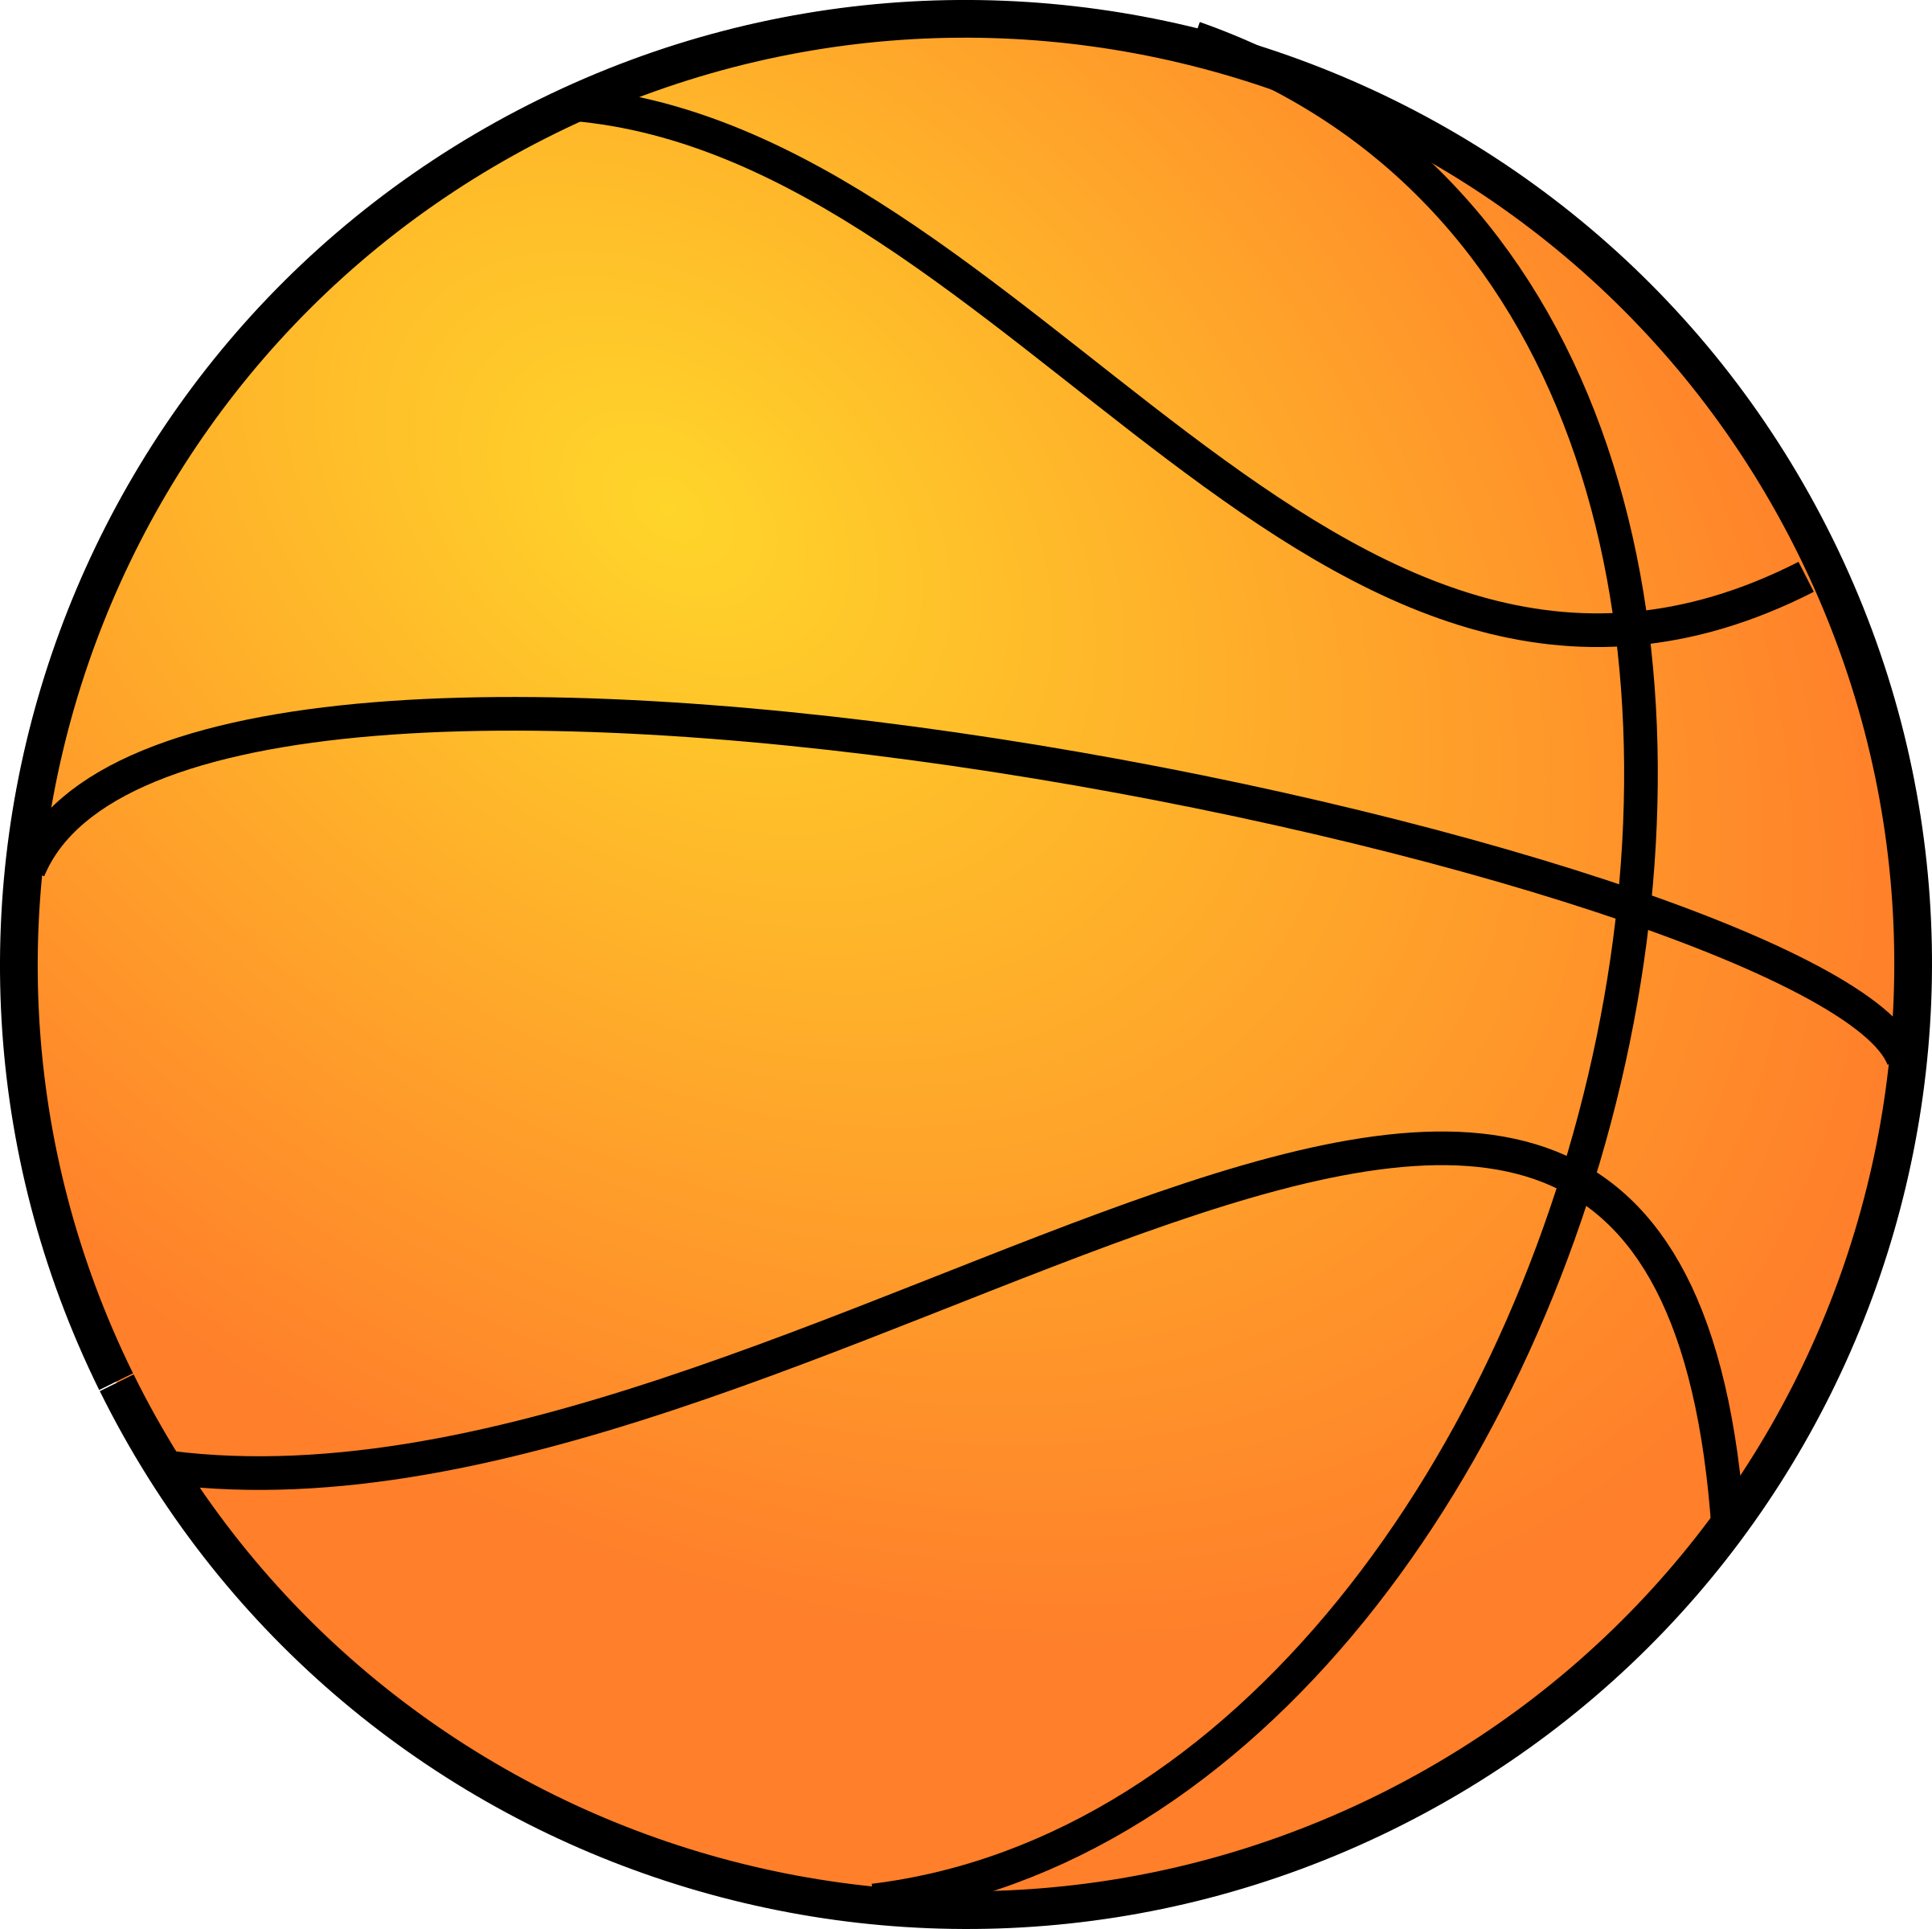 Basketball clipart simple.